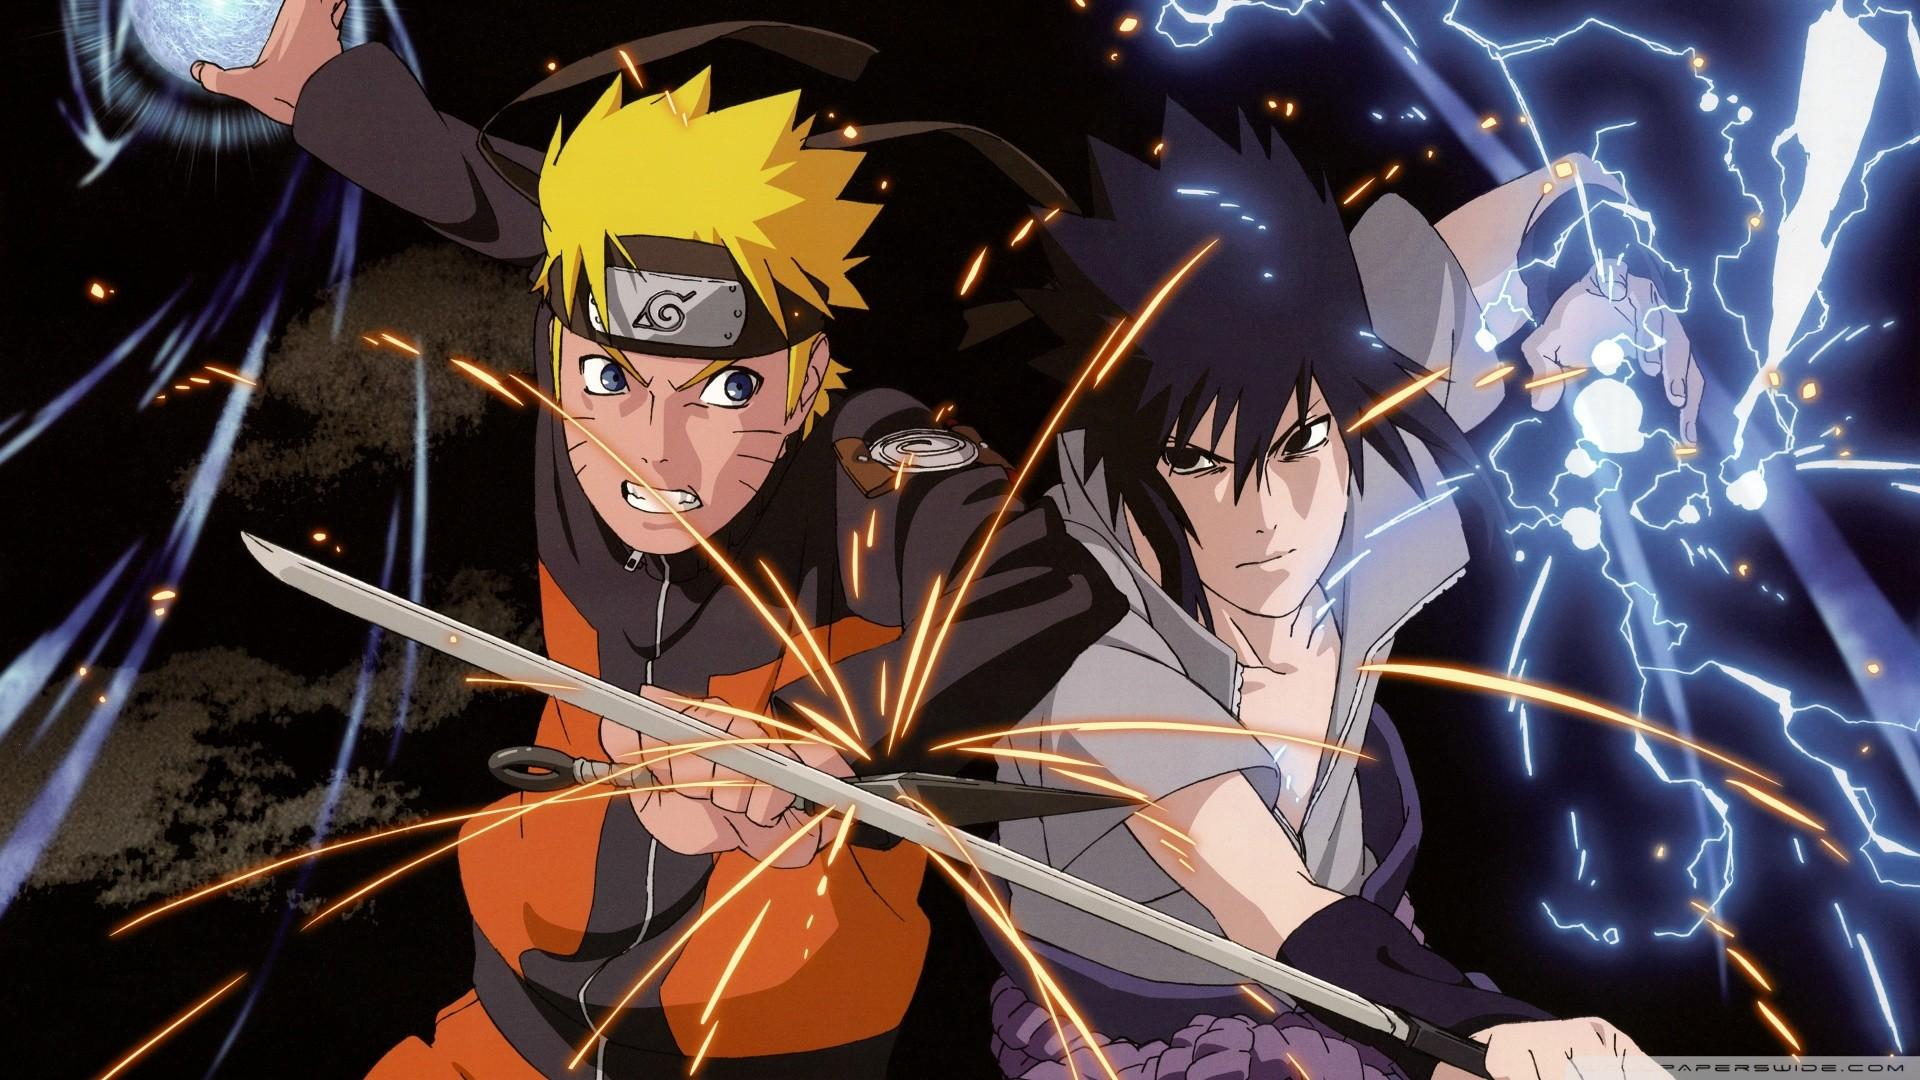 Naruto Vs Sasuke Wallpaper Wallpapertag